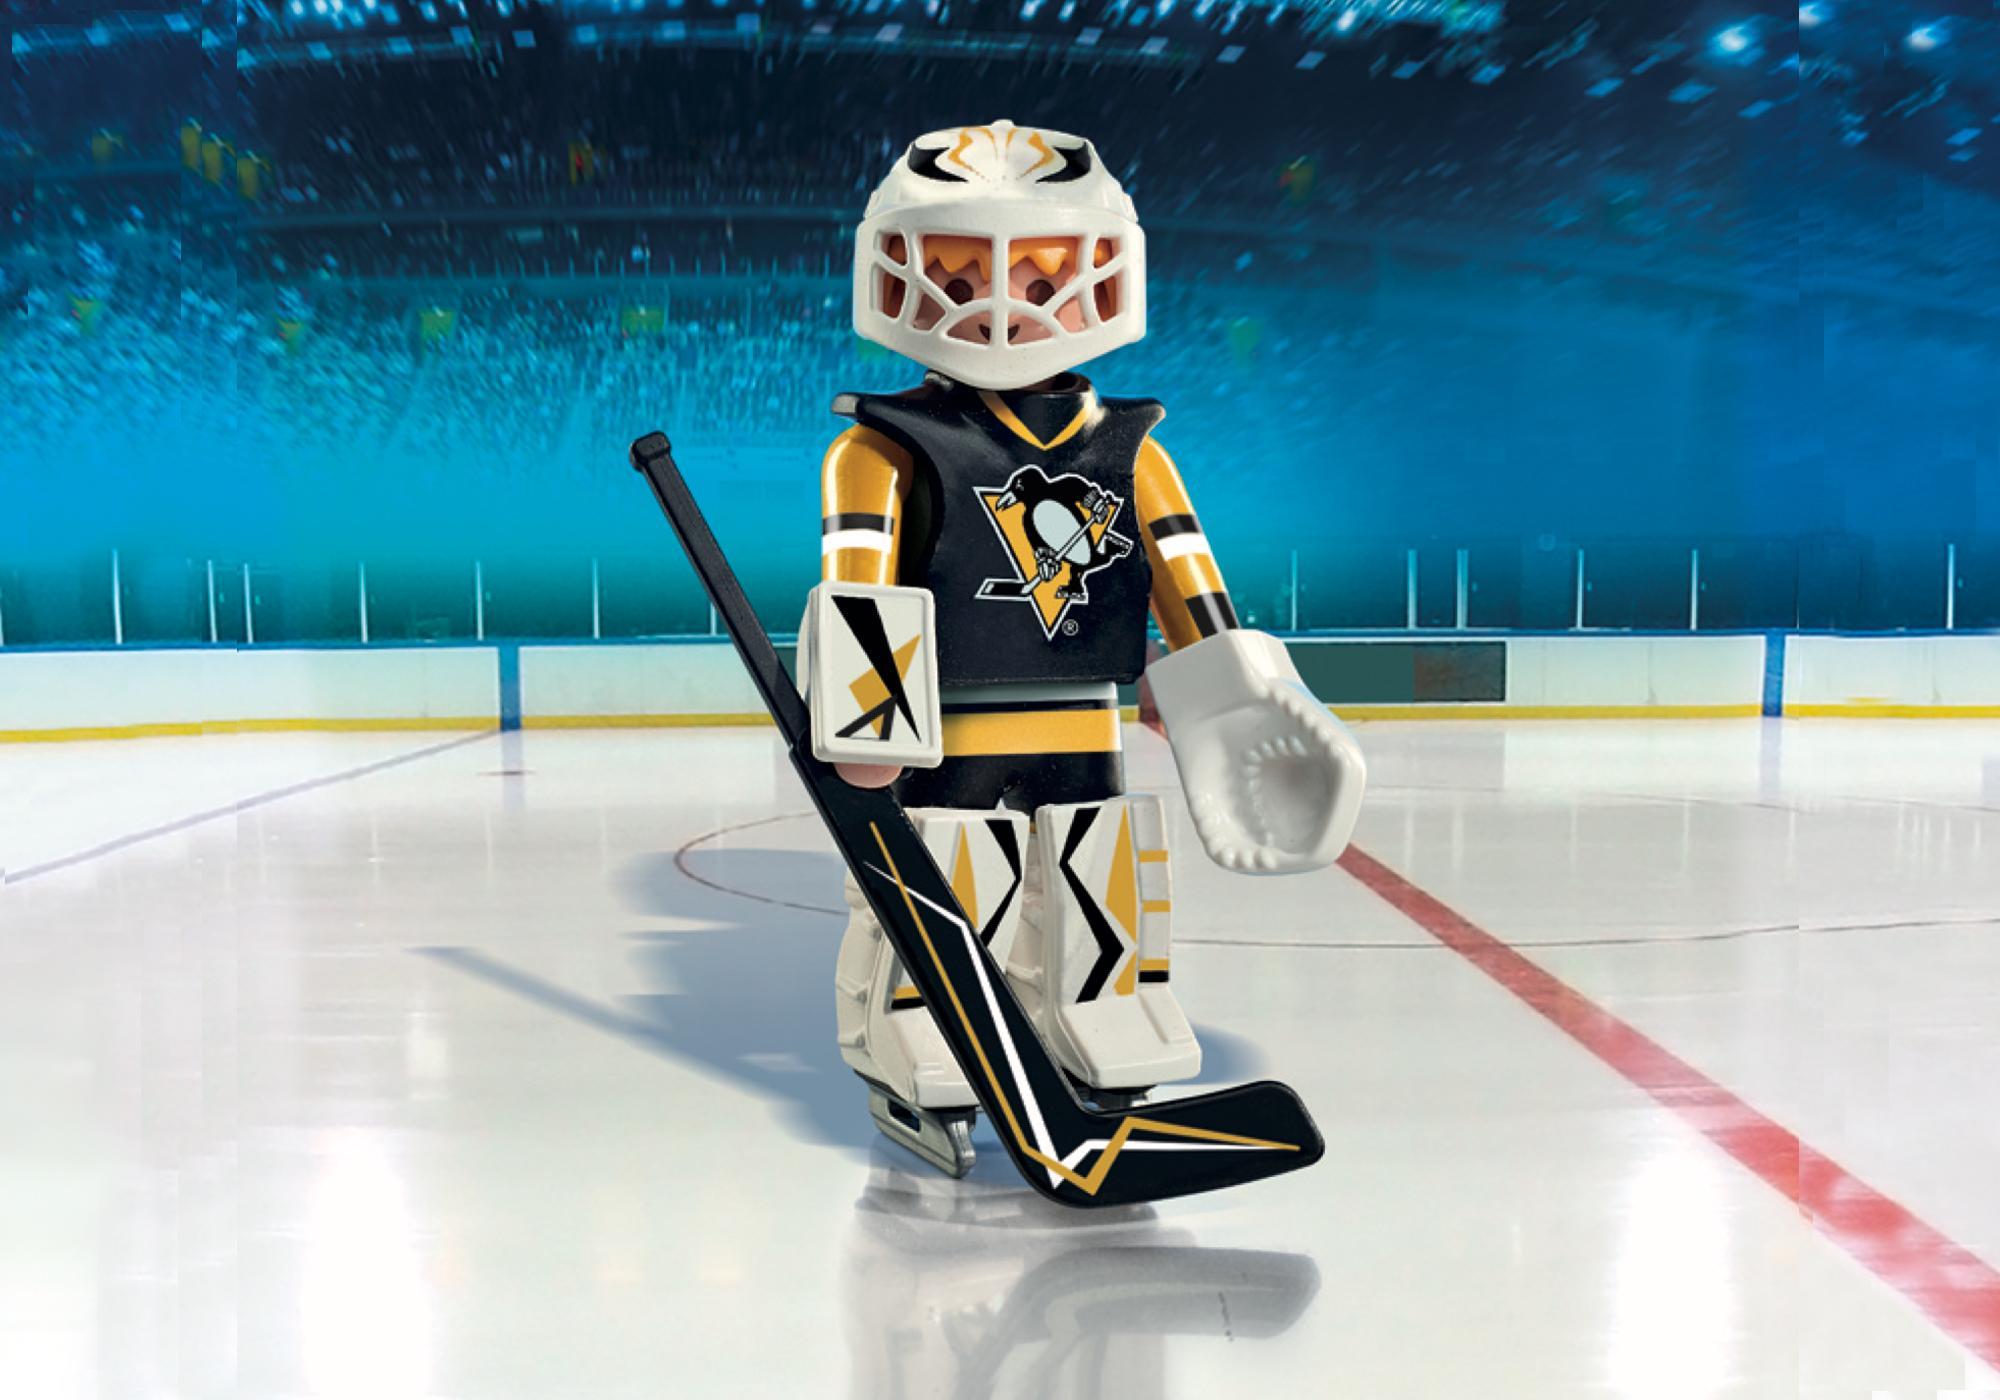 9028_product_detail/NHL® Pittsburgh Penguins® Goalie